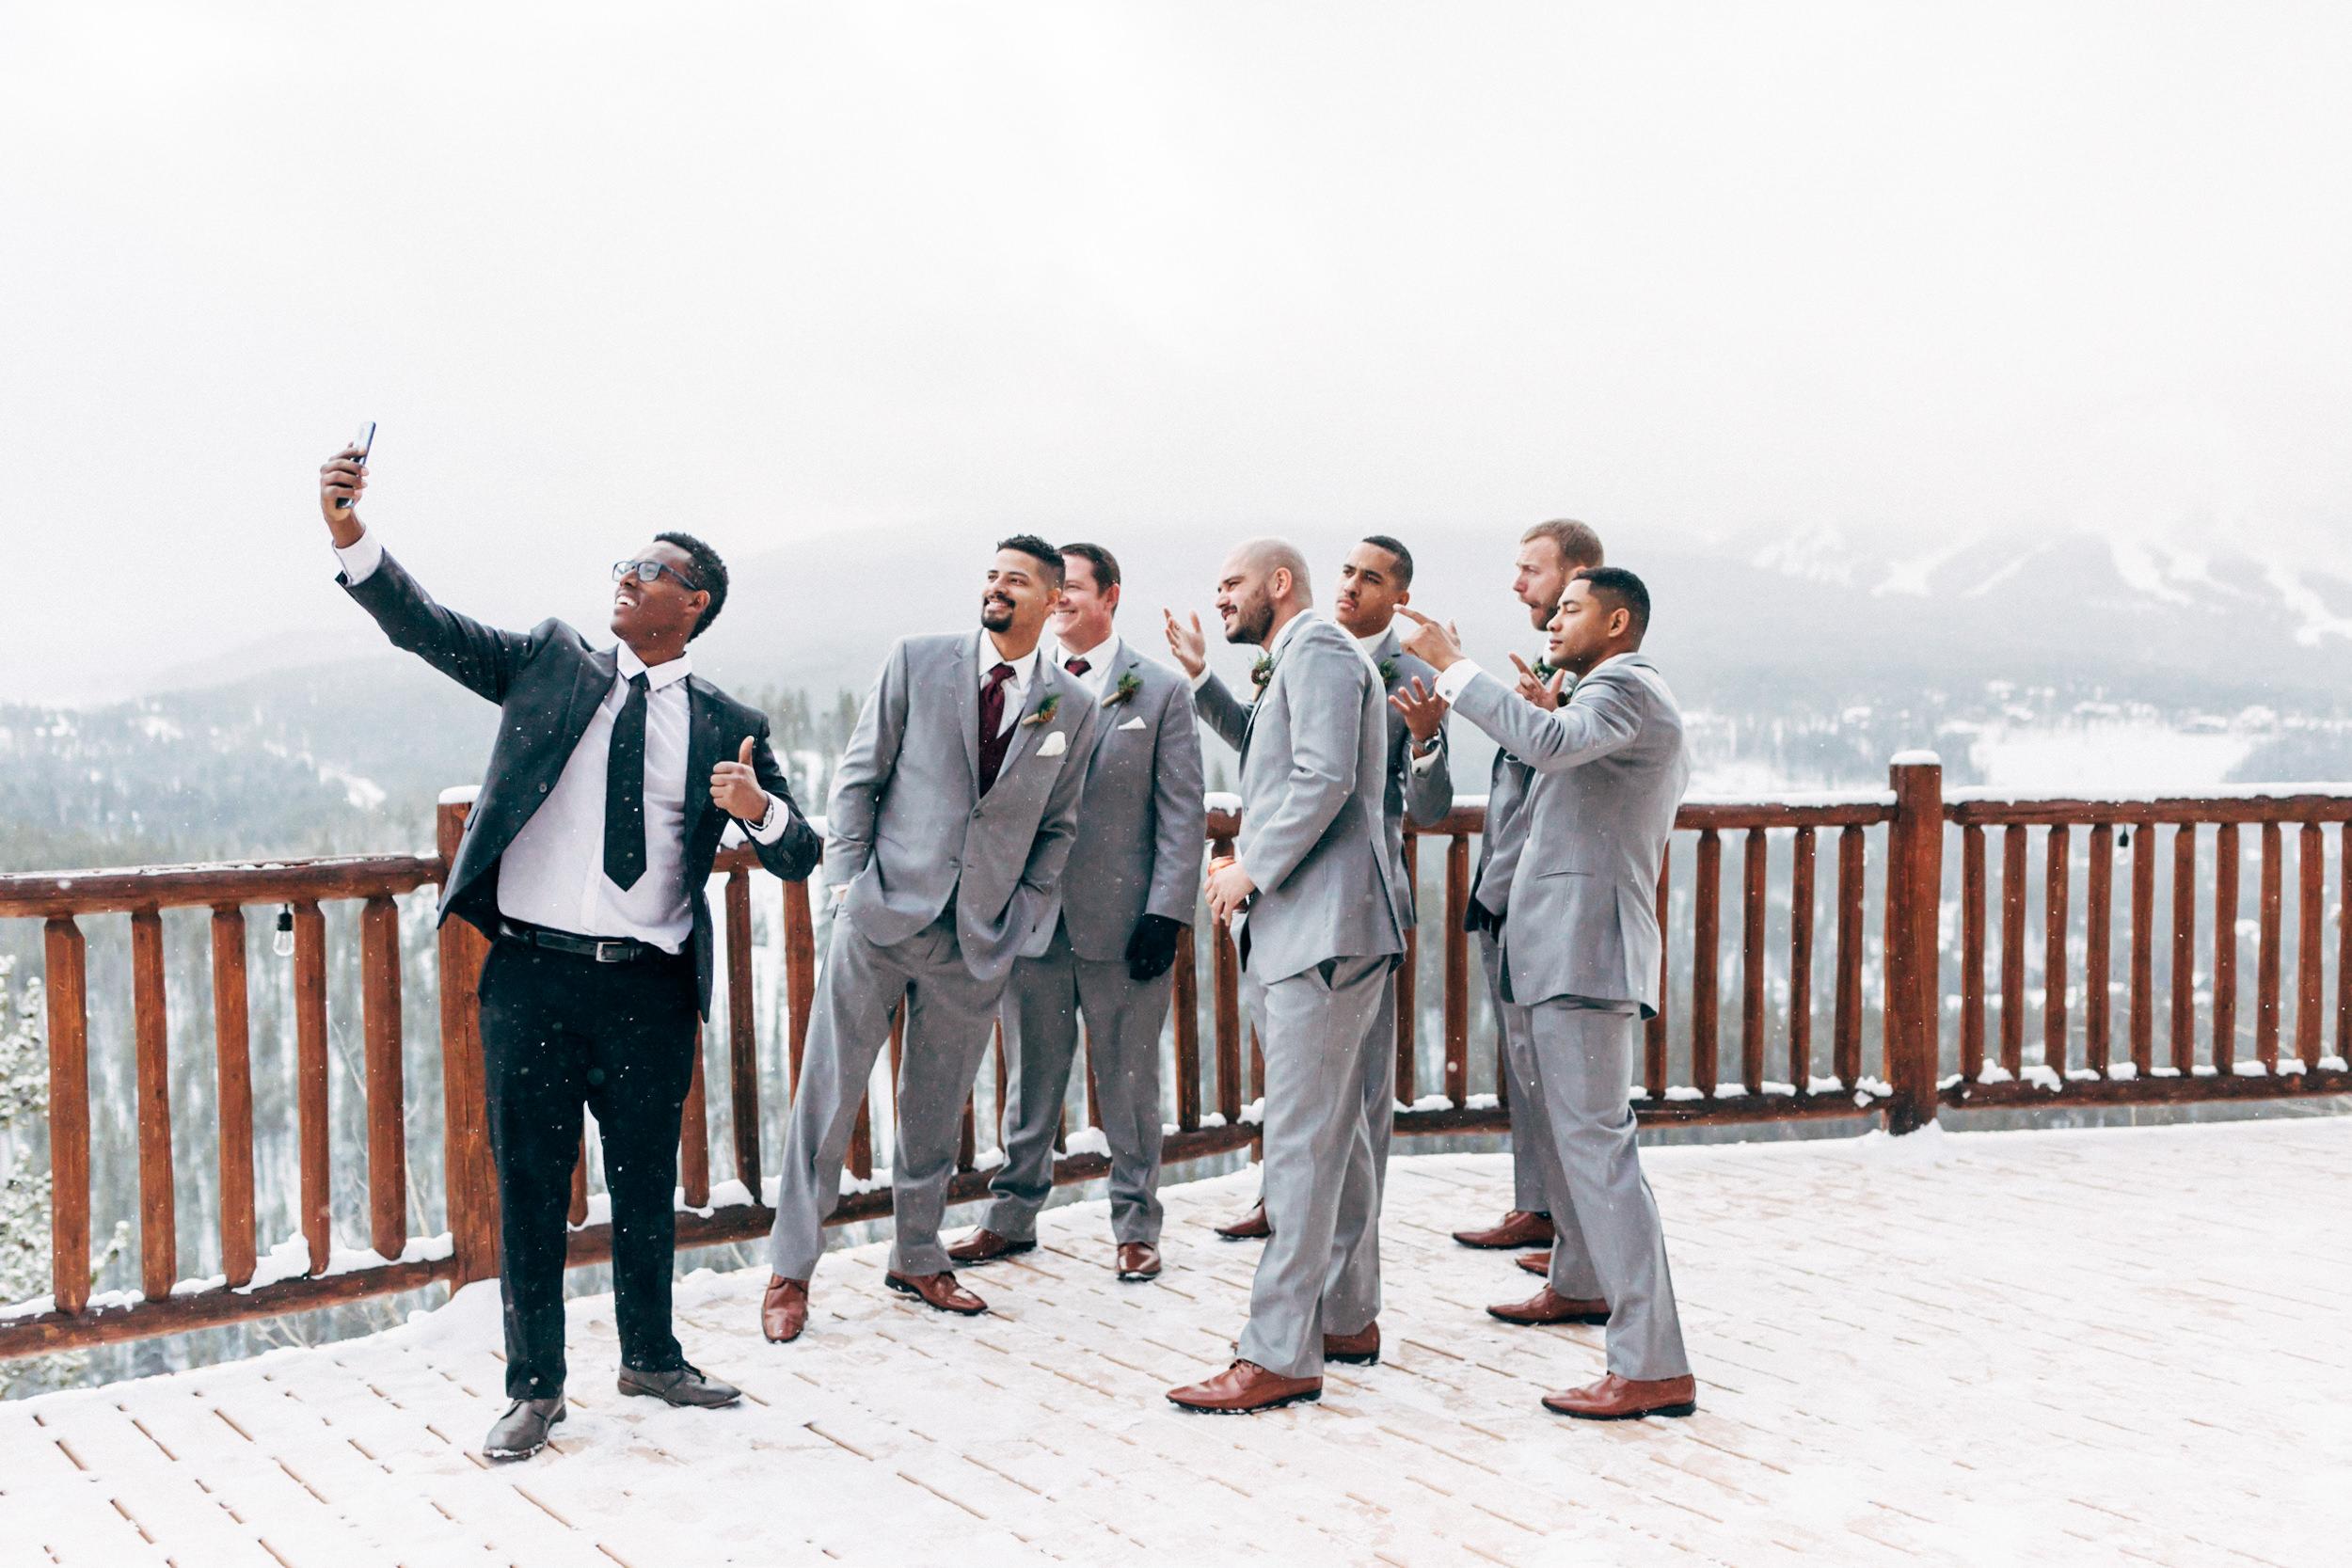 Groomsmen goofing off on Breckenridge Lodge deck. Colorado wedding photographer.